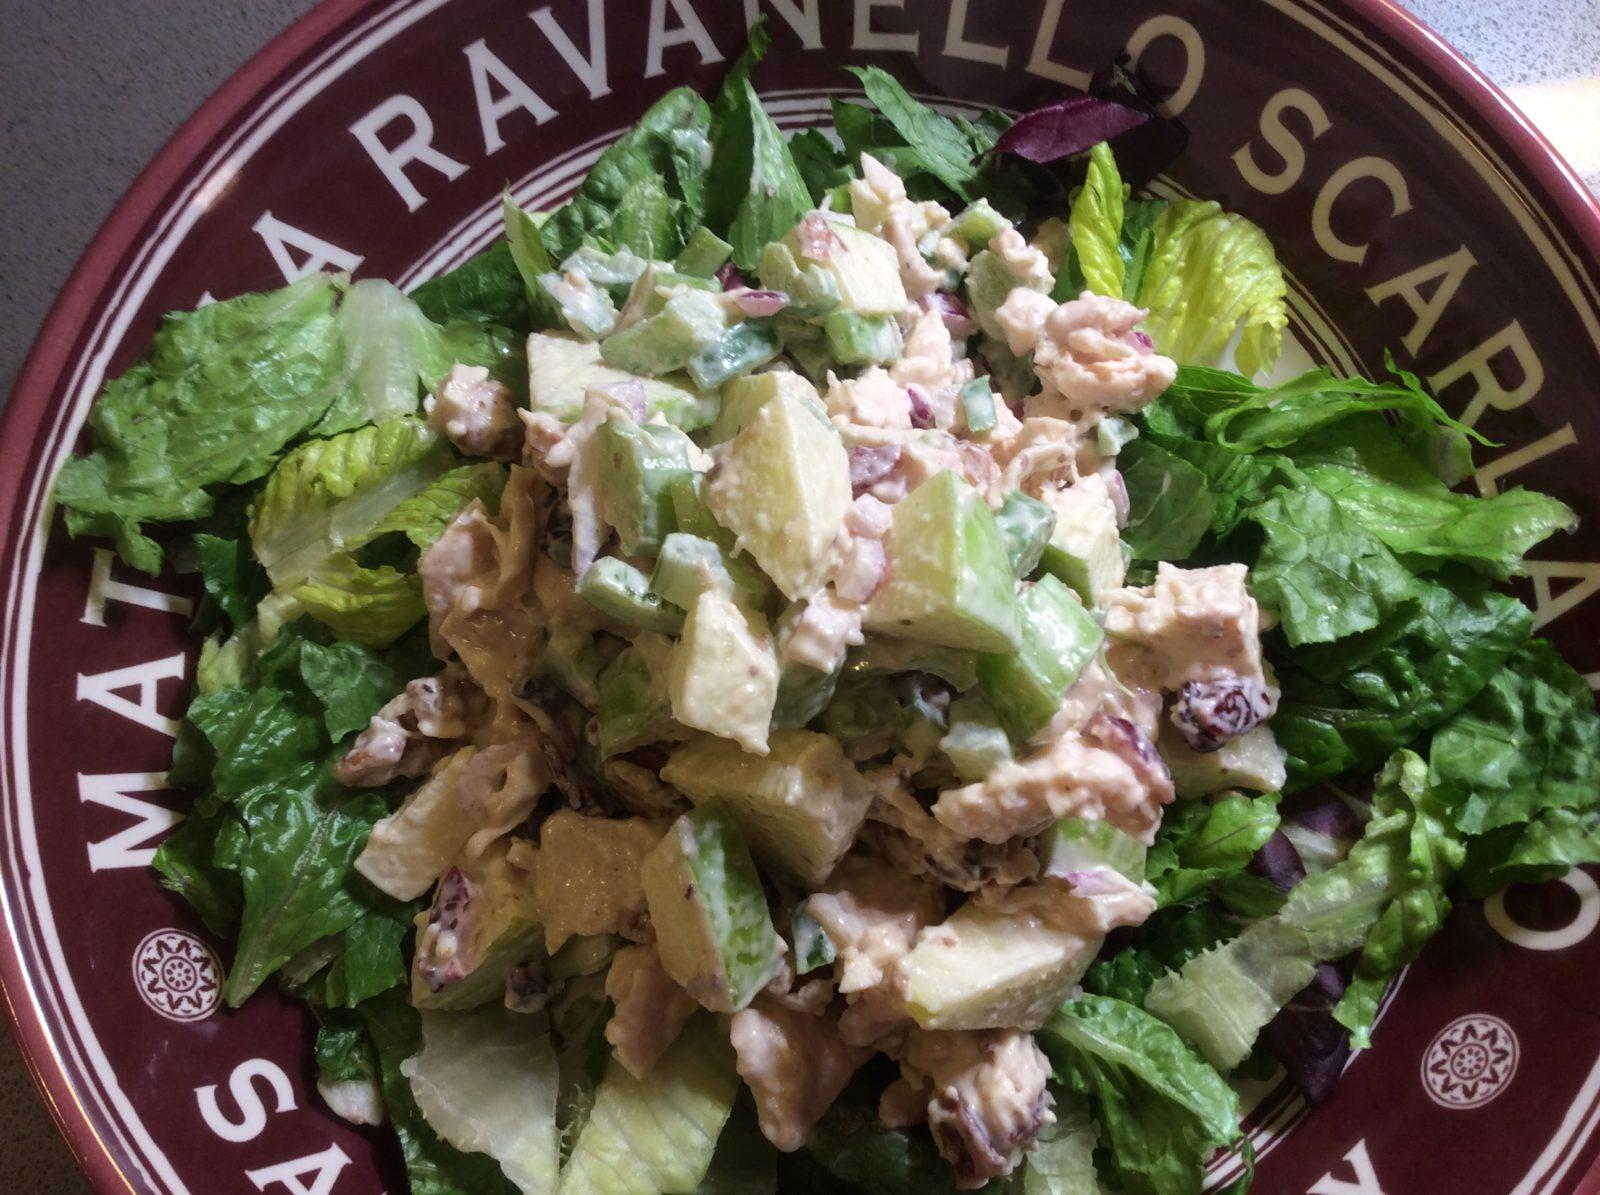 Zippy Chicken Cranberry and Walnut Salad